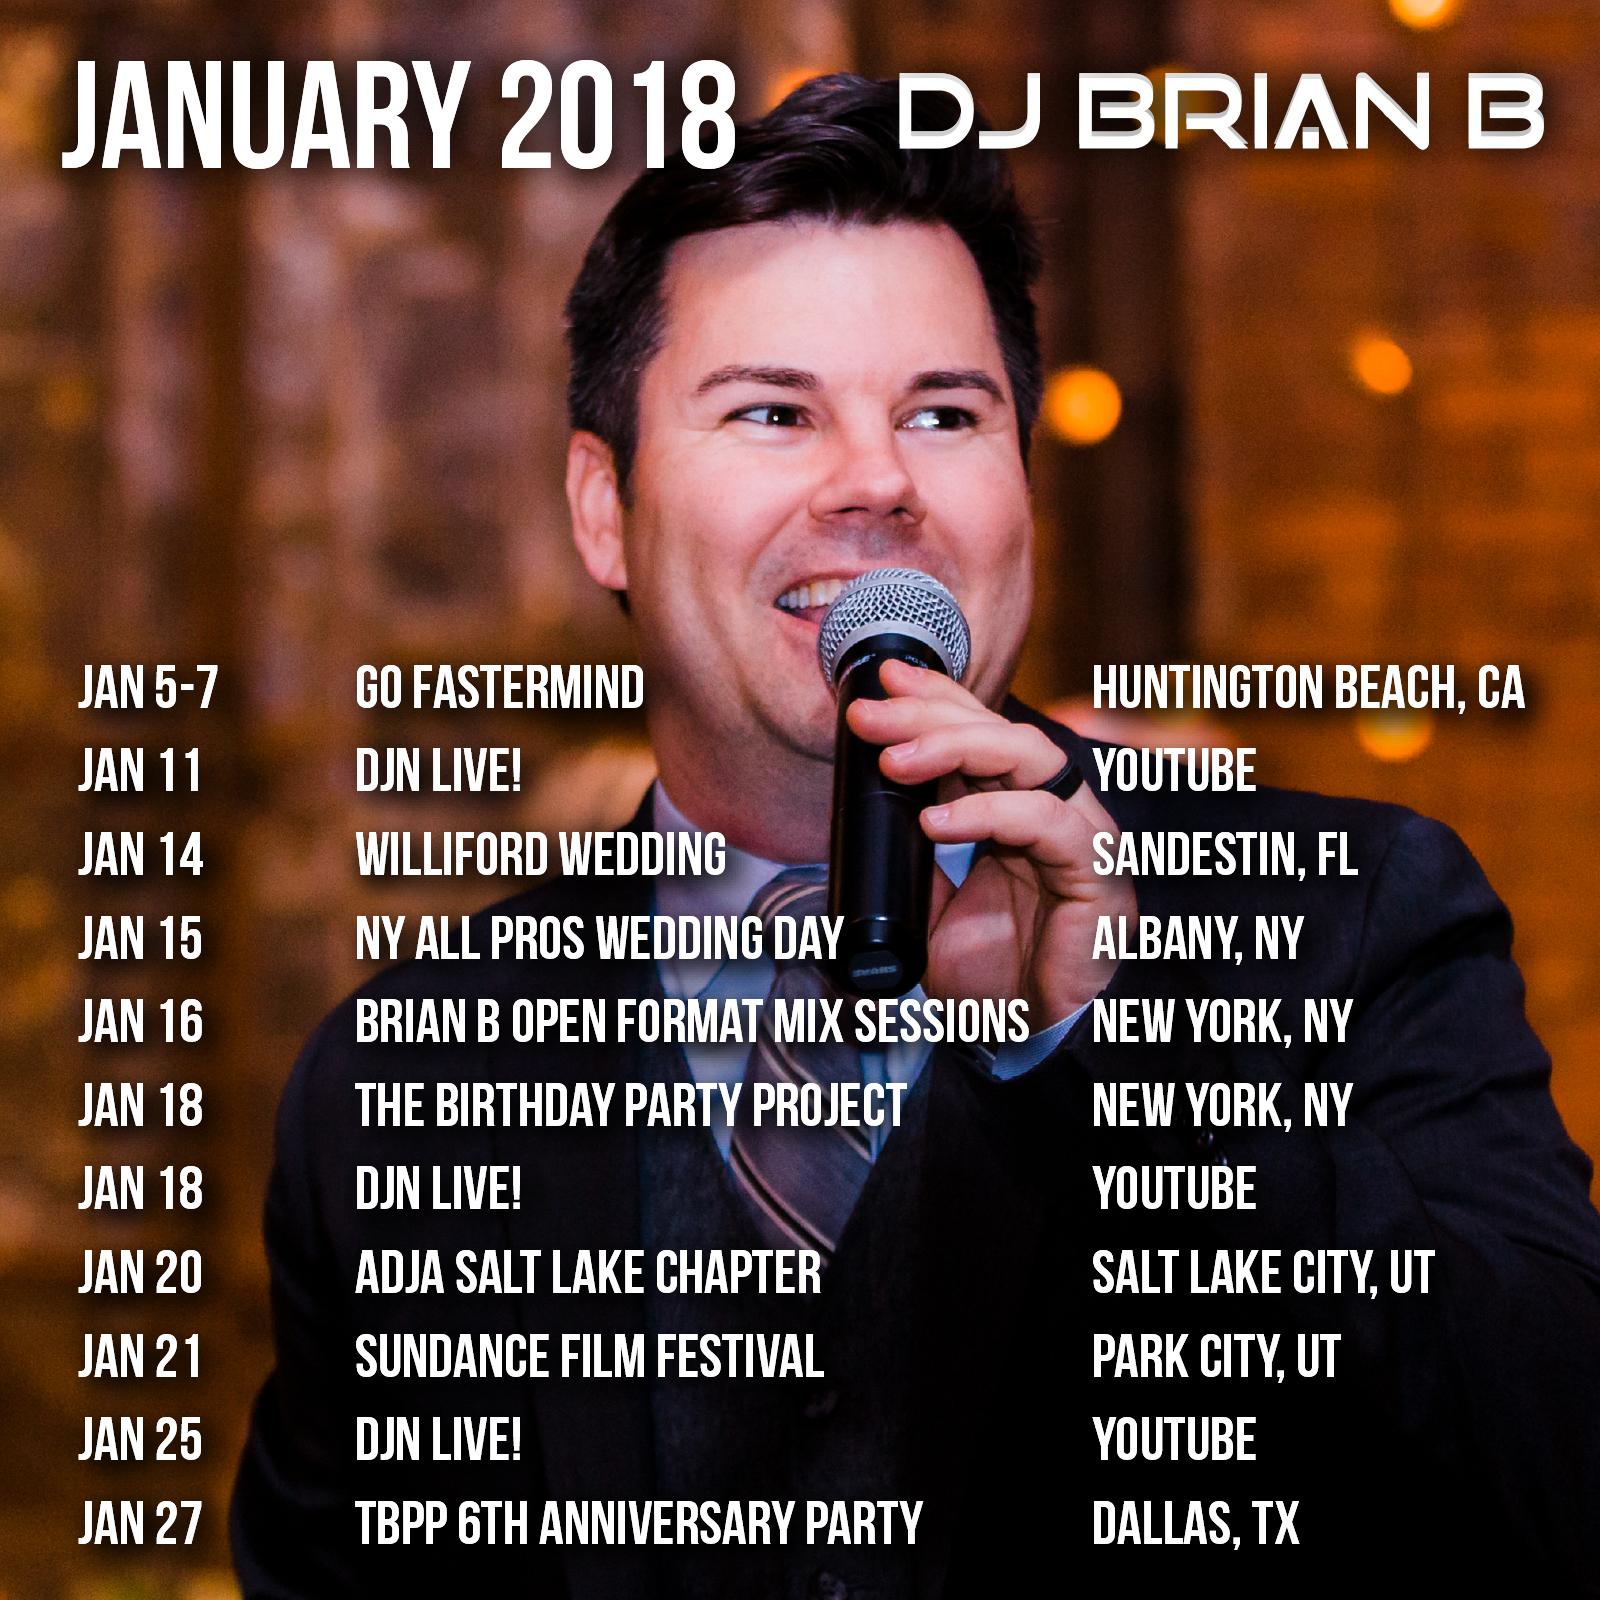 January 2018 Brian B Event Schedule